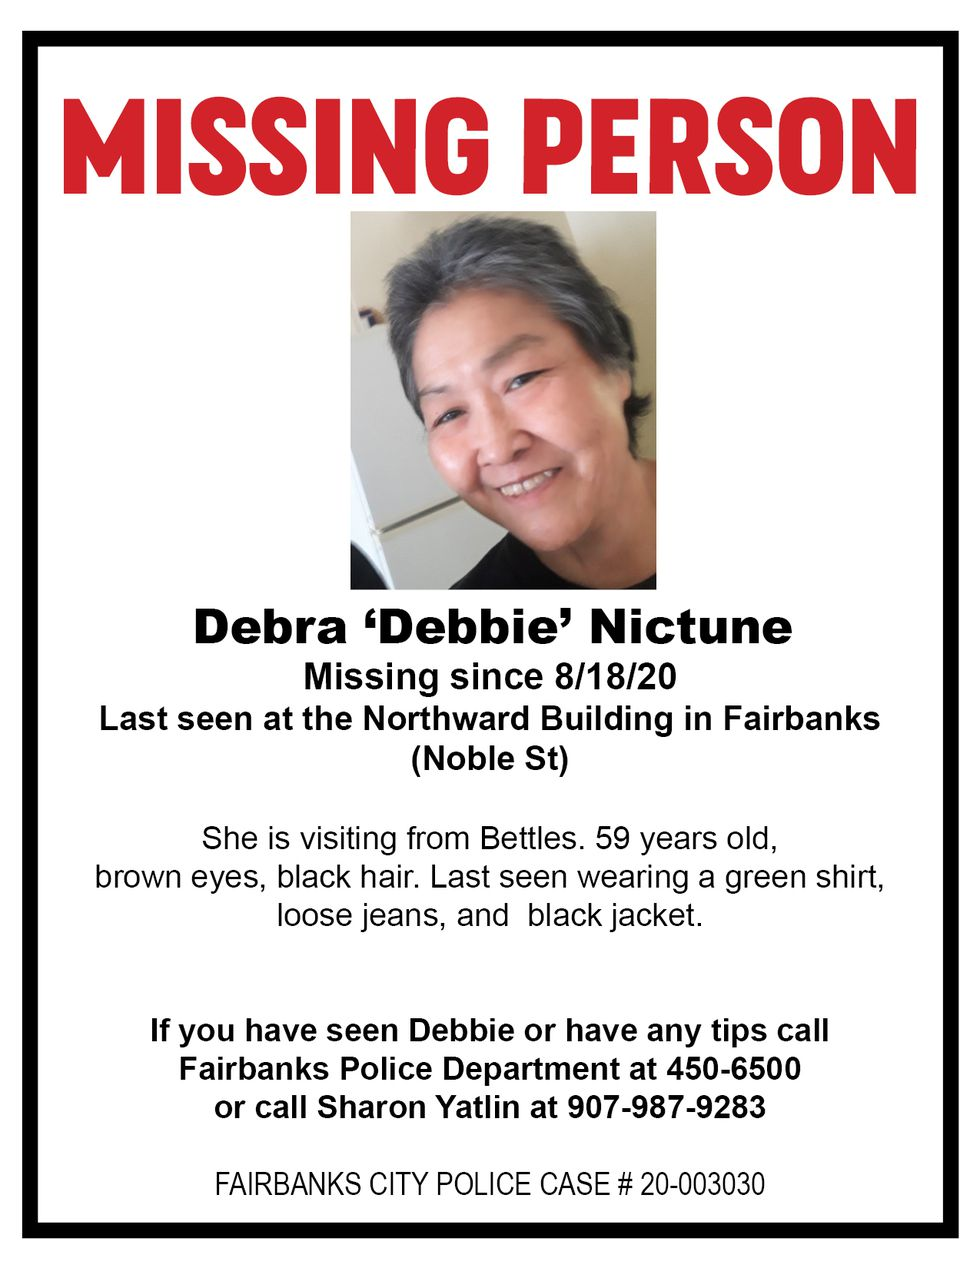 Missing person flyer for Debra 'Debbie' Nictune.